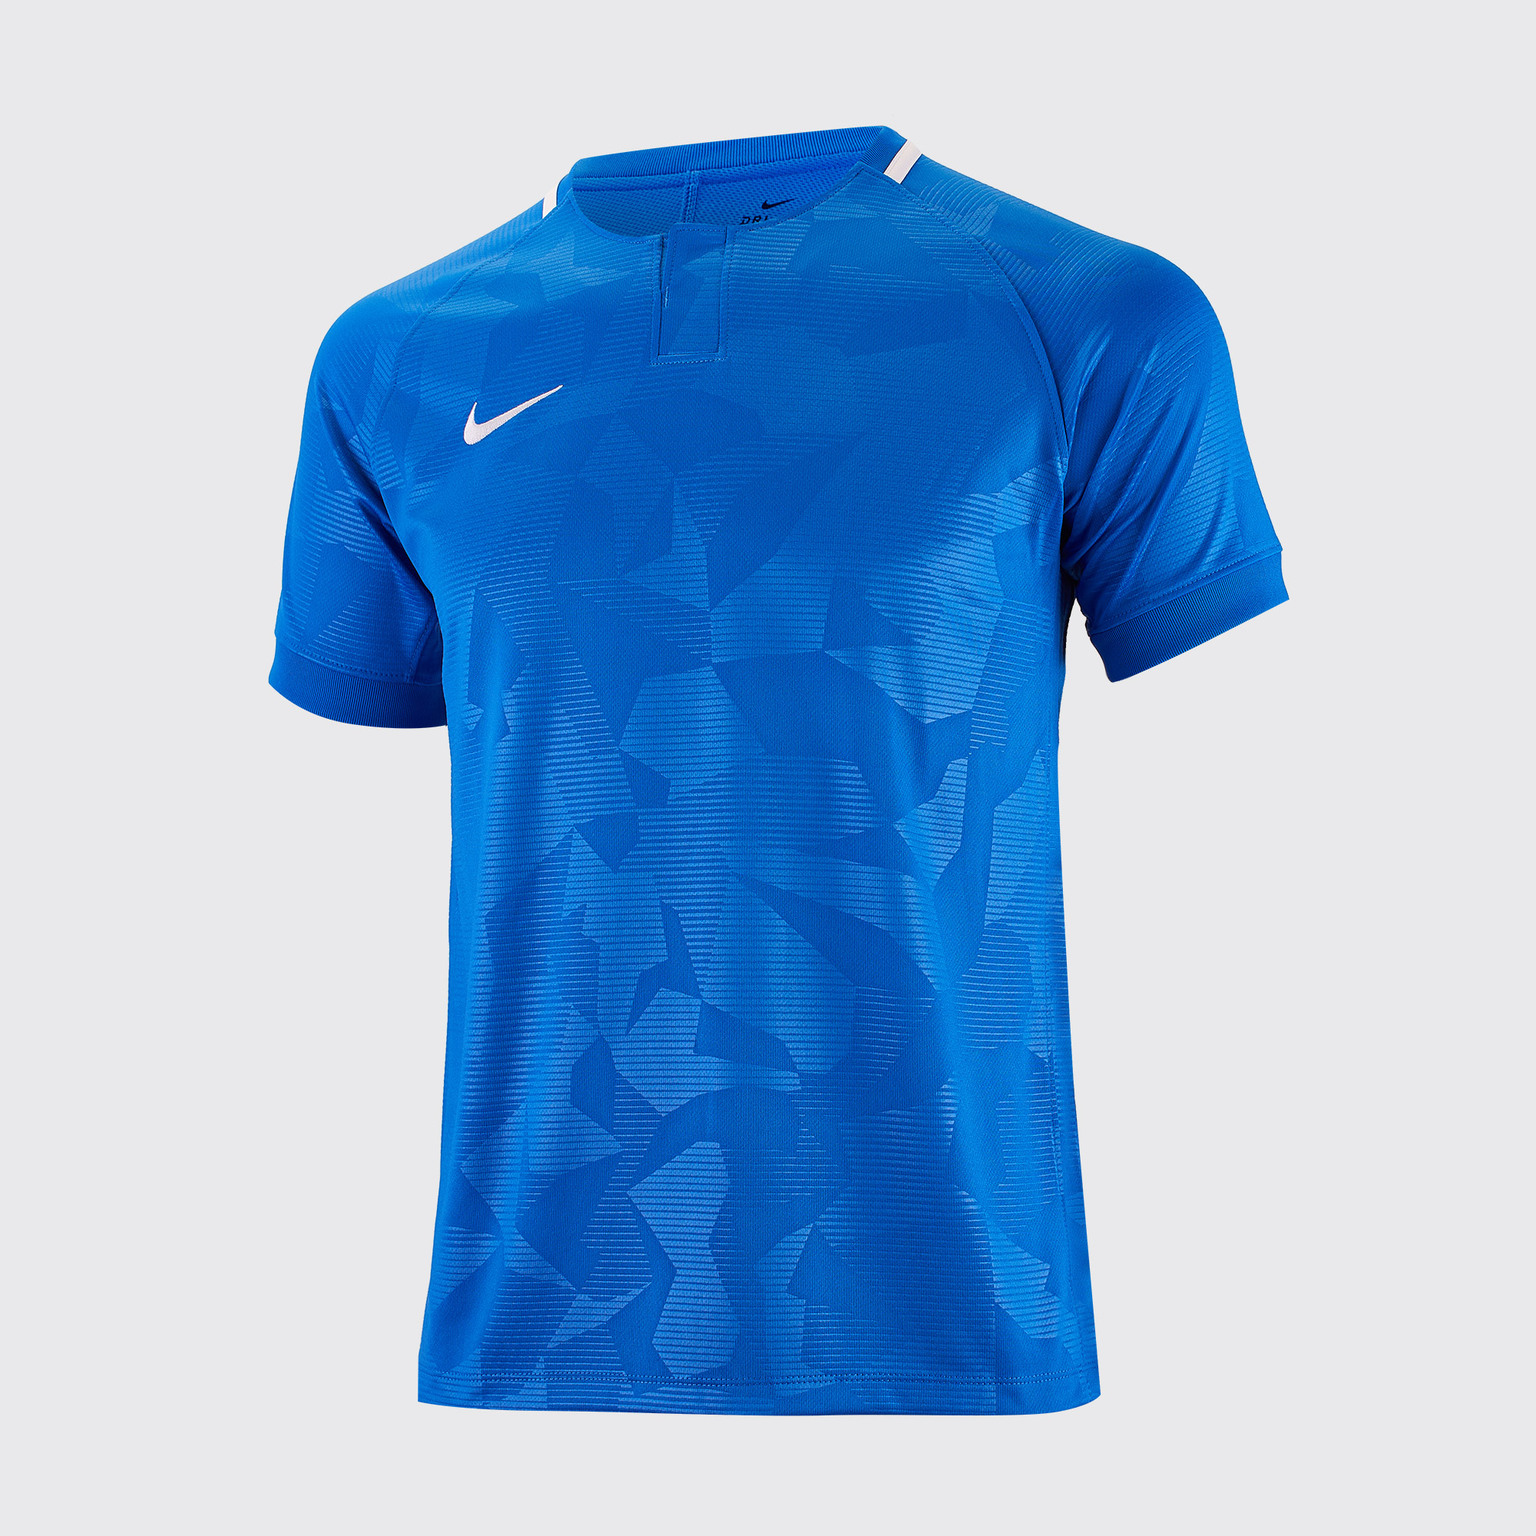 Тренировочная форма Nike Футболка тренировочная детская Nike Dry Challenge II 894053-463 игровая форма nike футболка детская nike ss precision iii jsy boys 645918 410